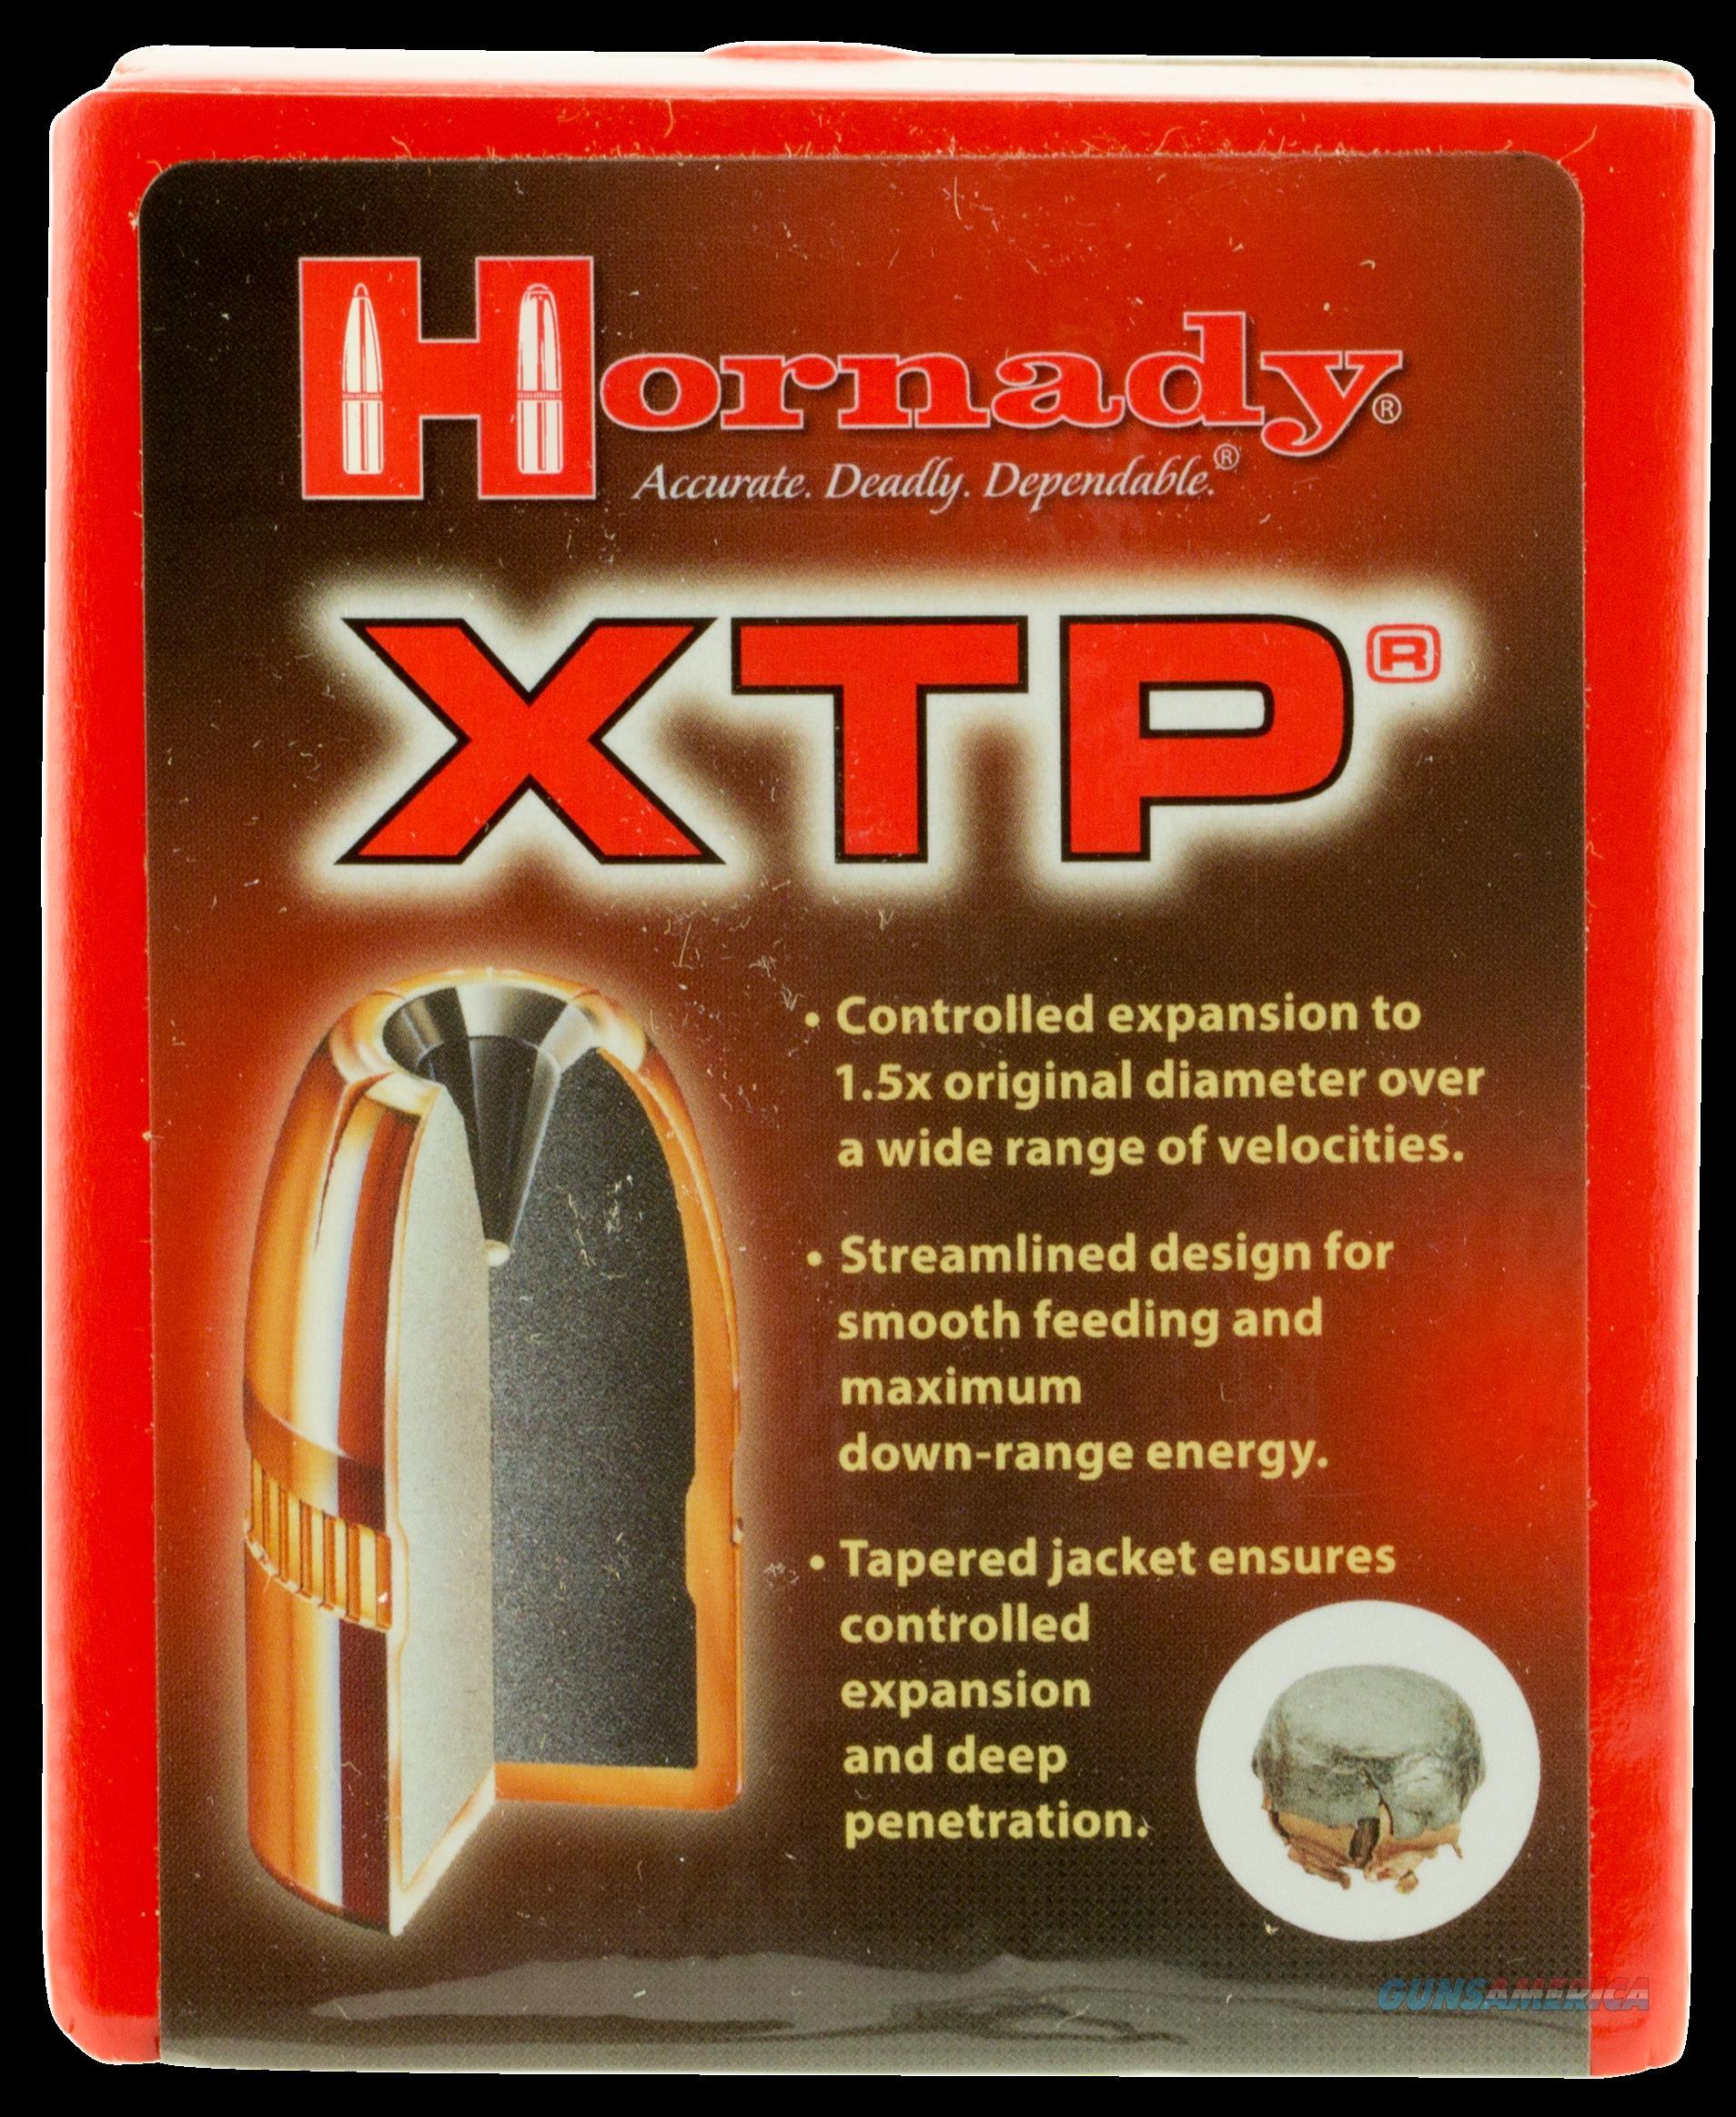 Hornady Xtp, Horn 44200 Bull .430  240 Hpxtp    100  Guns > Pistols > 1911 Pistol Copies (non-Colt)